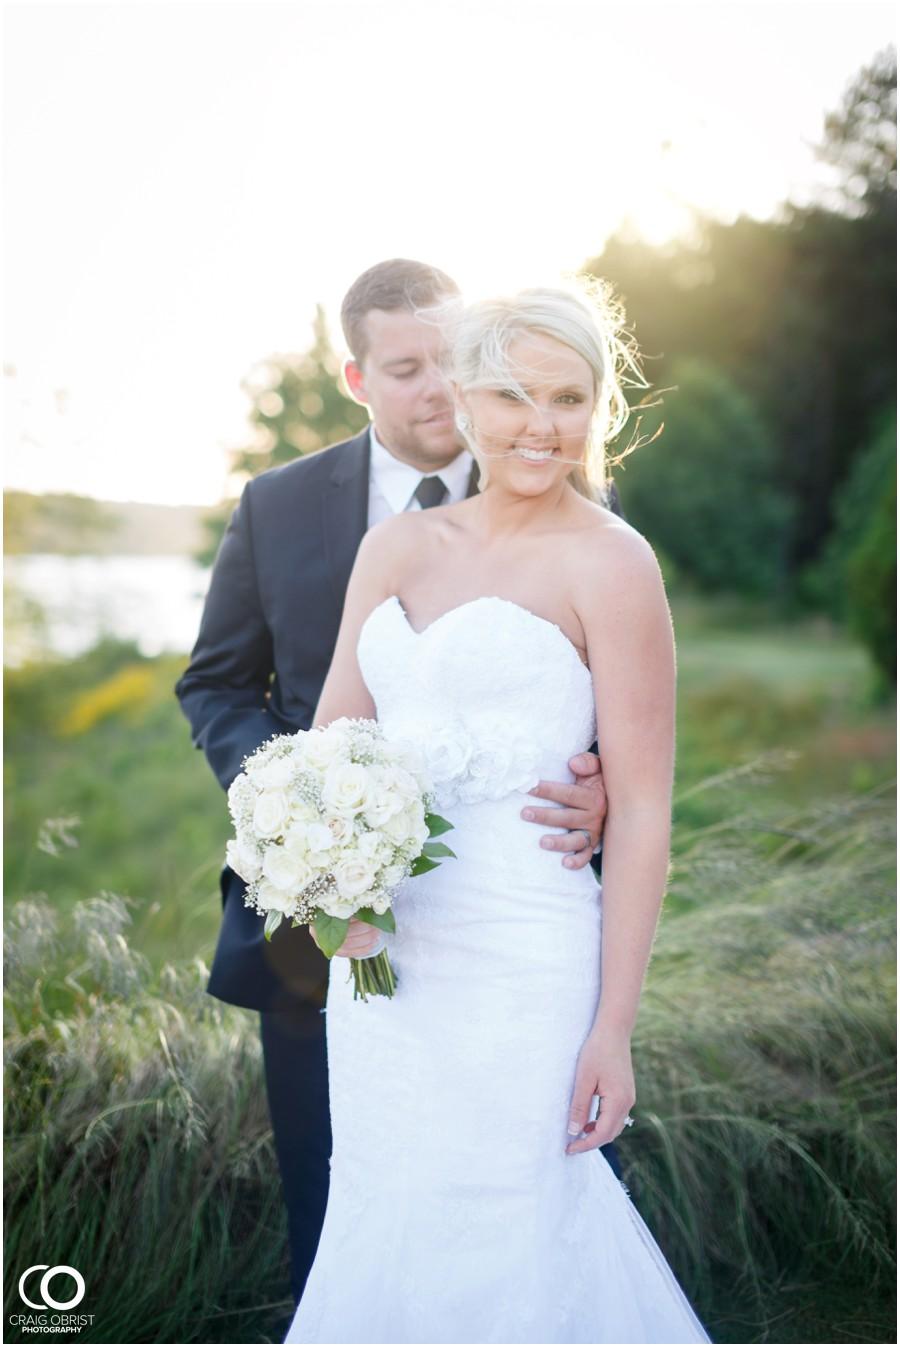 Lake-Lanier-Islands-Wedding-Golf-Course-Atlanta-Portraits_0060.jpg